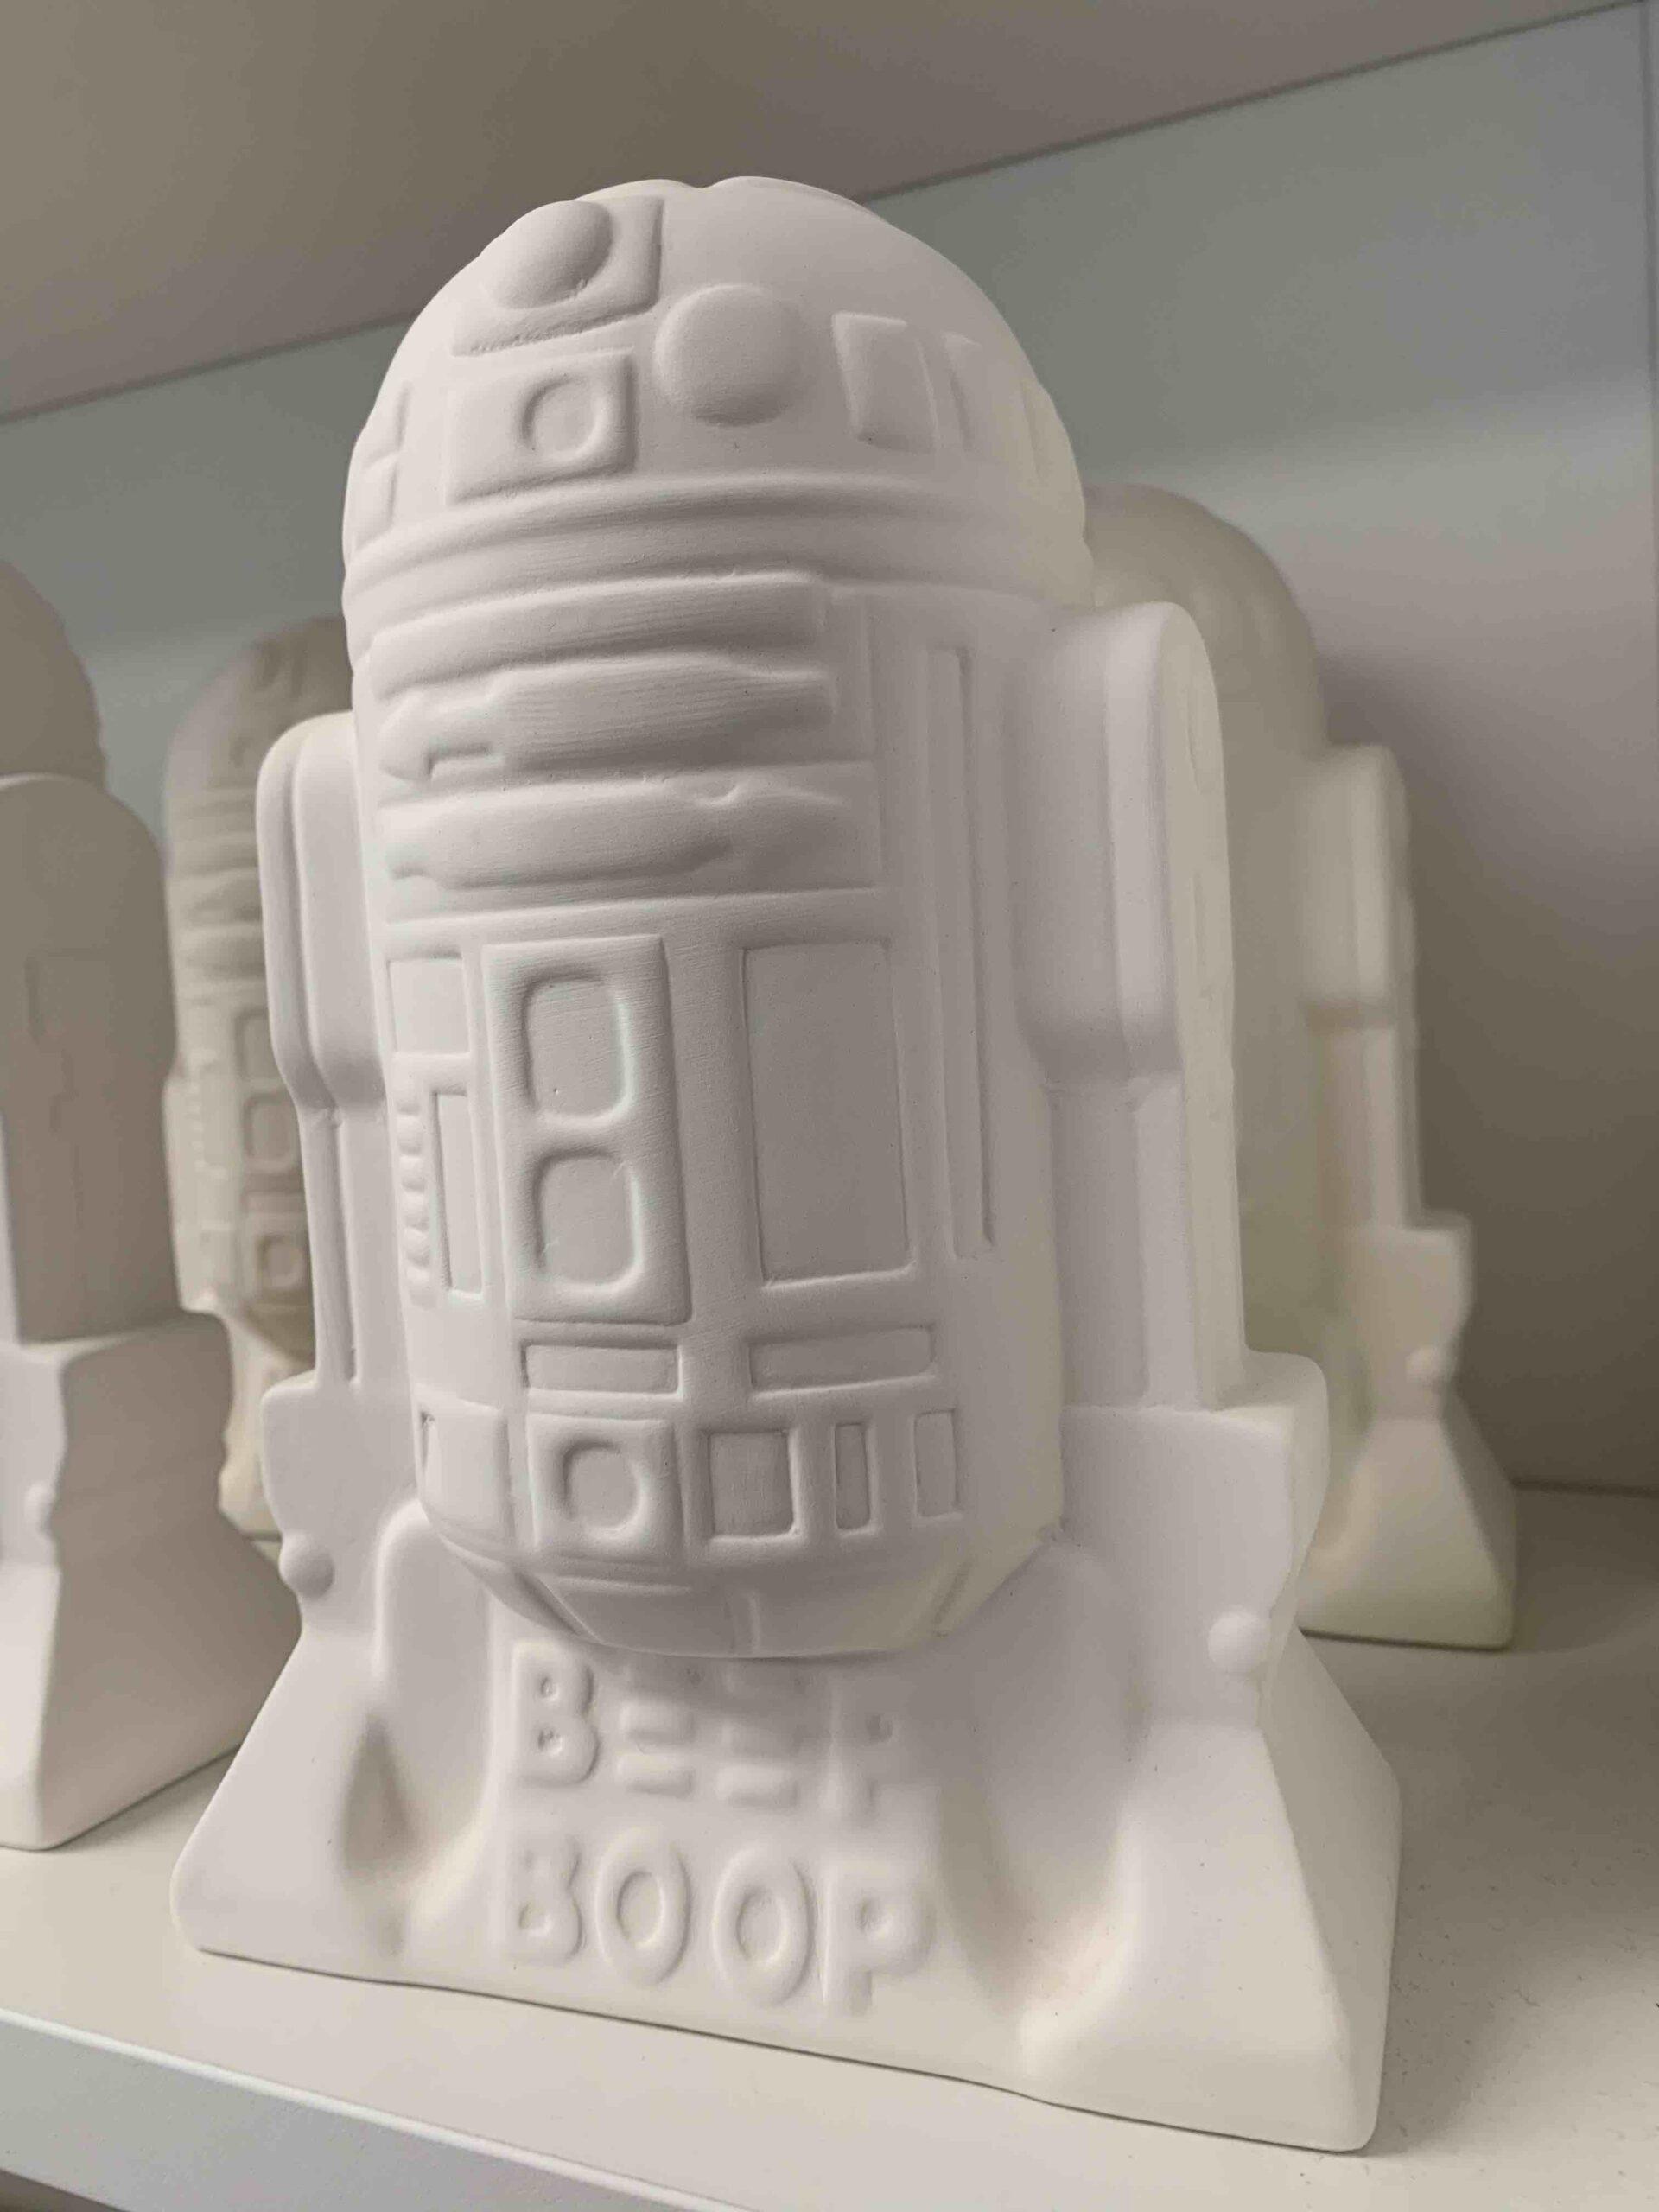 Create Art Studio Ceramics Paint at home kit DIY R2-D2 Star Wars Money Bank